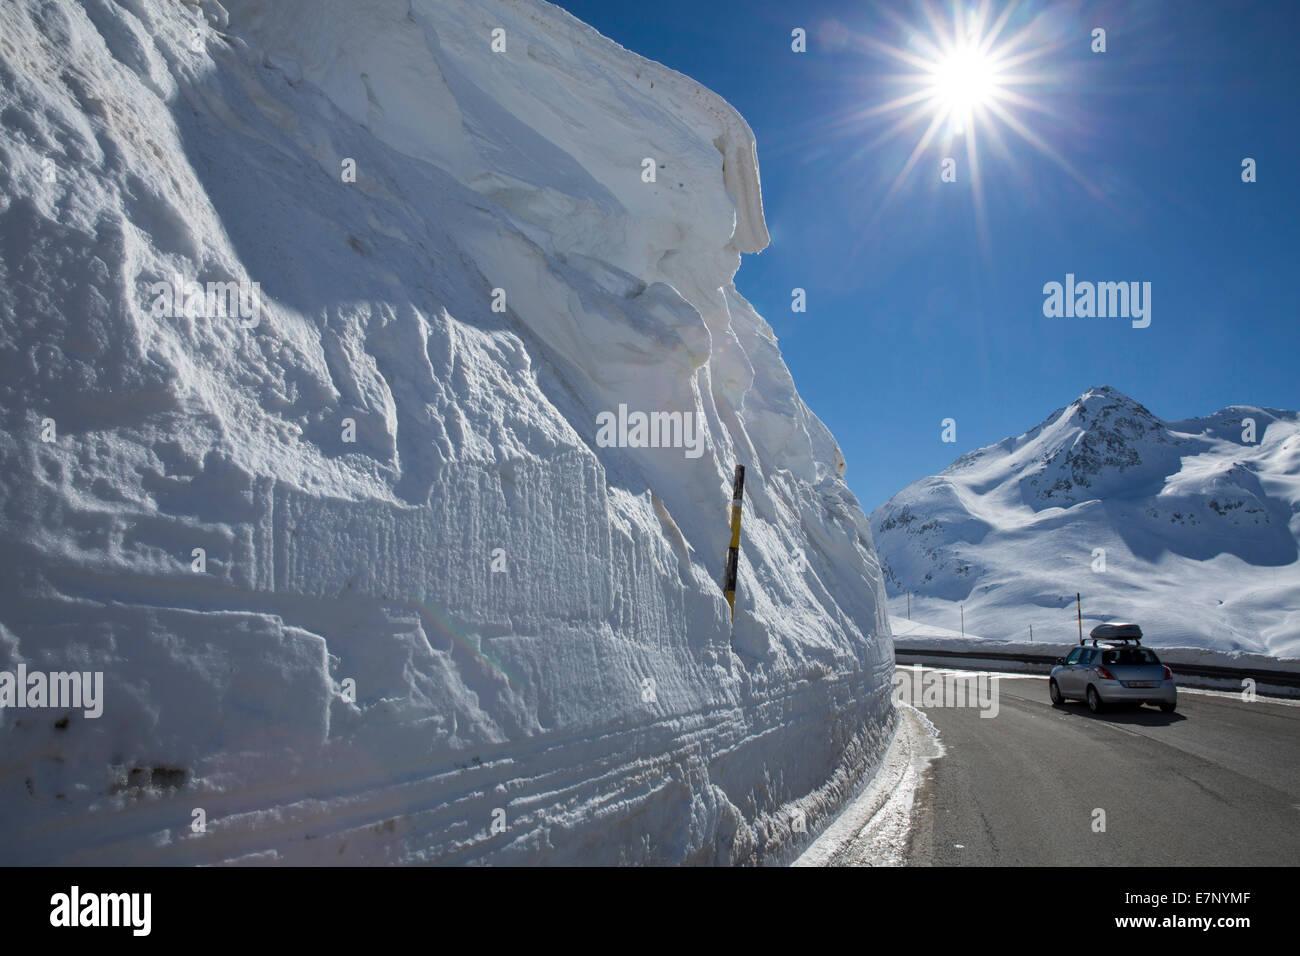 Engadina Engadina alta, muri di neve, del Bernina, street, inverno, Canton, GR, Grigioni, Grigioni, alta Engadina, Immagini Stock